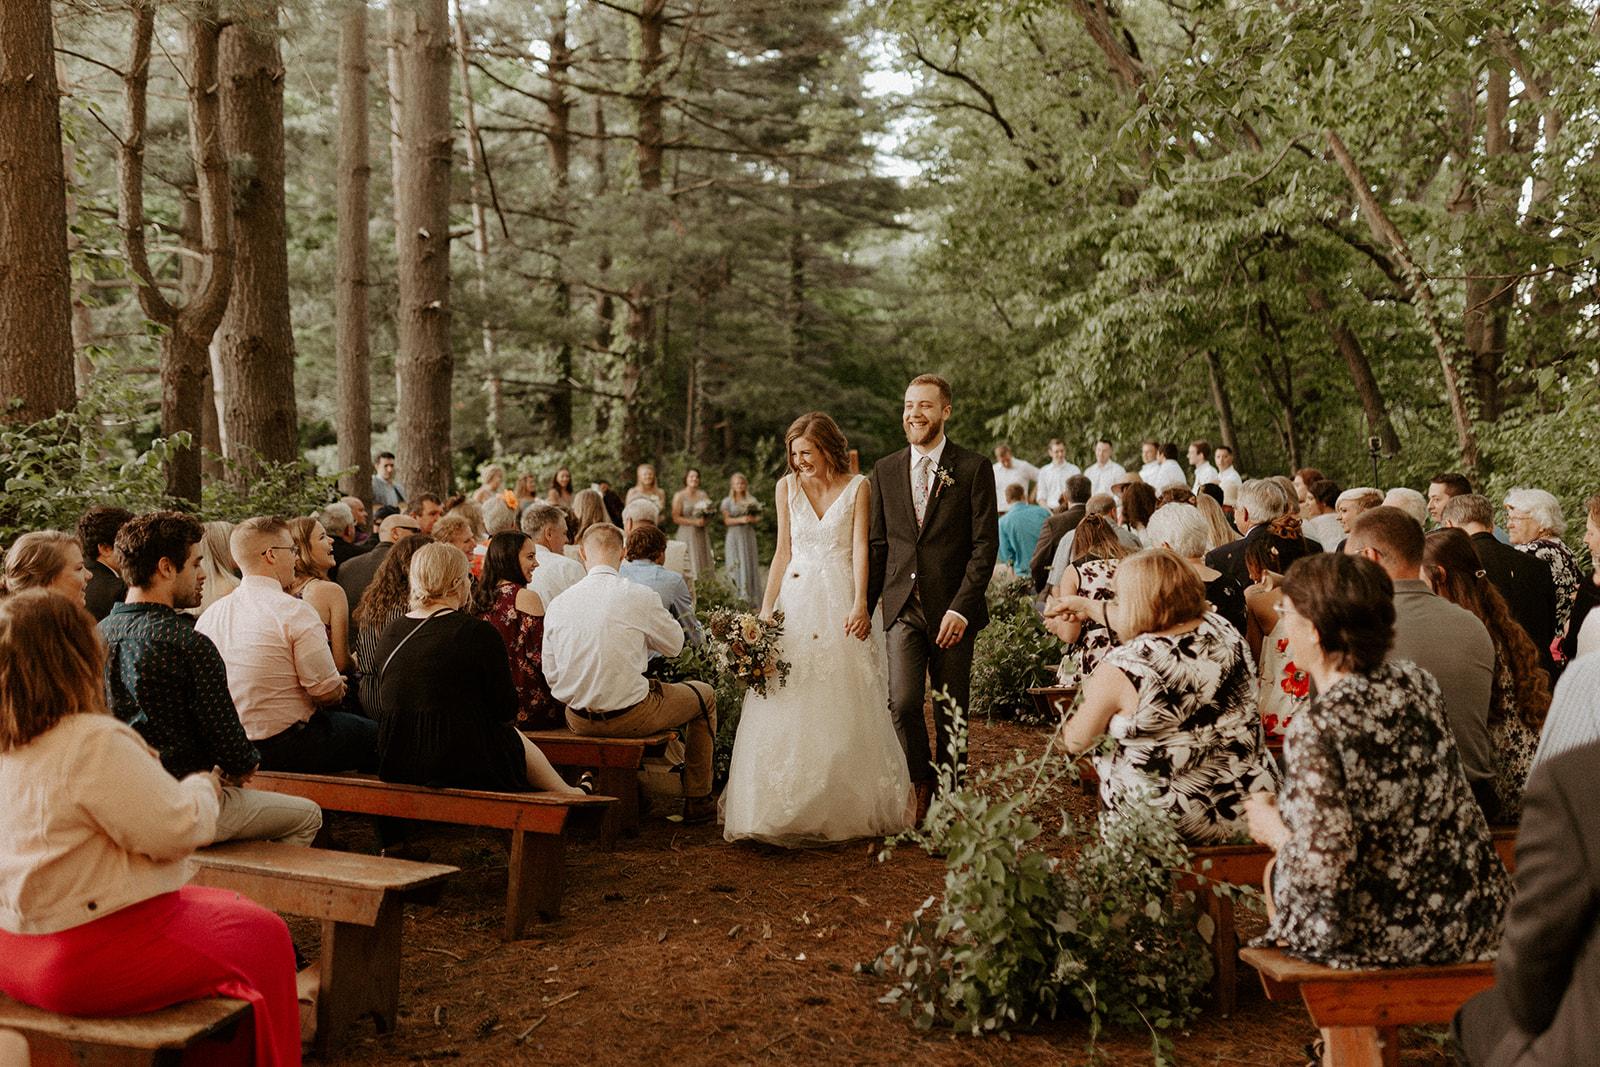 camp_wokanda_peoria_illinois_wedding_photographer_wright_photographs_bliese_0283.jpg